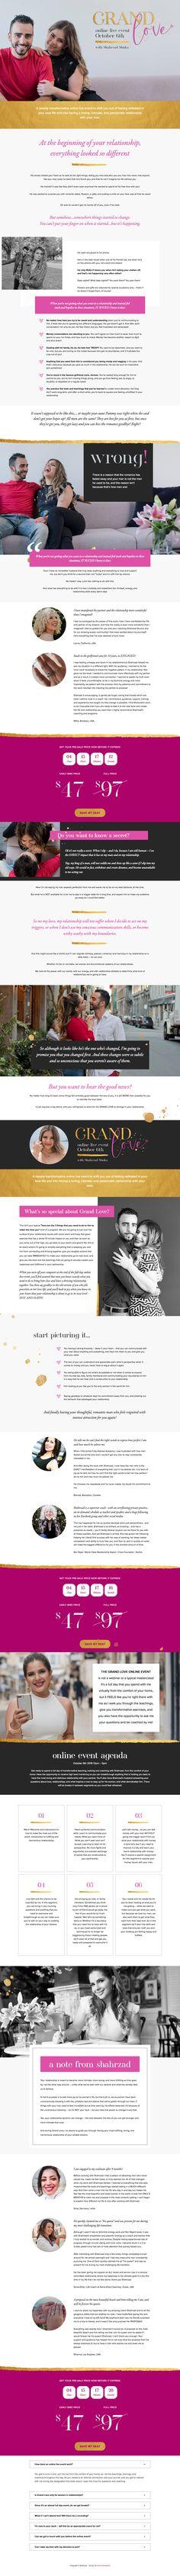 Entrepreneur, Personal Branding, Page Design, Ecommerce, Branding Design, Design Web, E Commerce, Corporate Design, Identity Branding